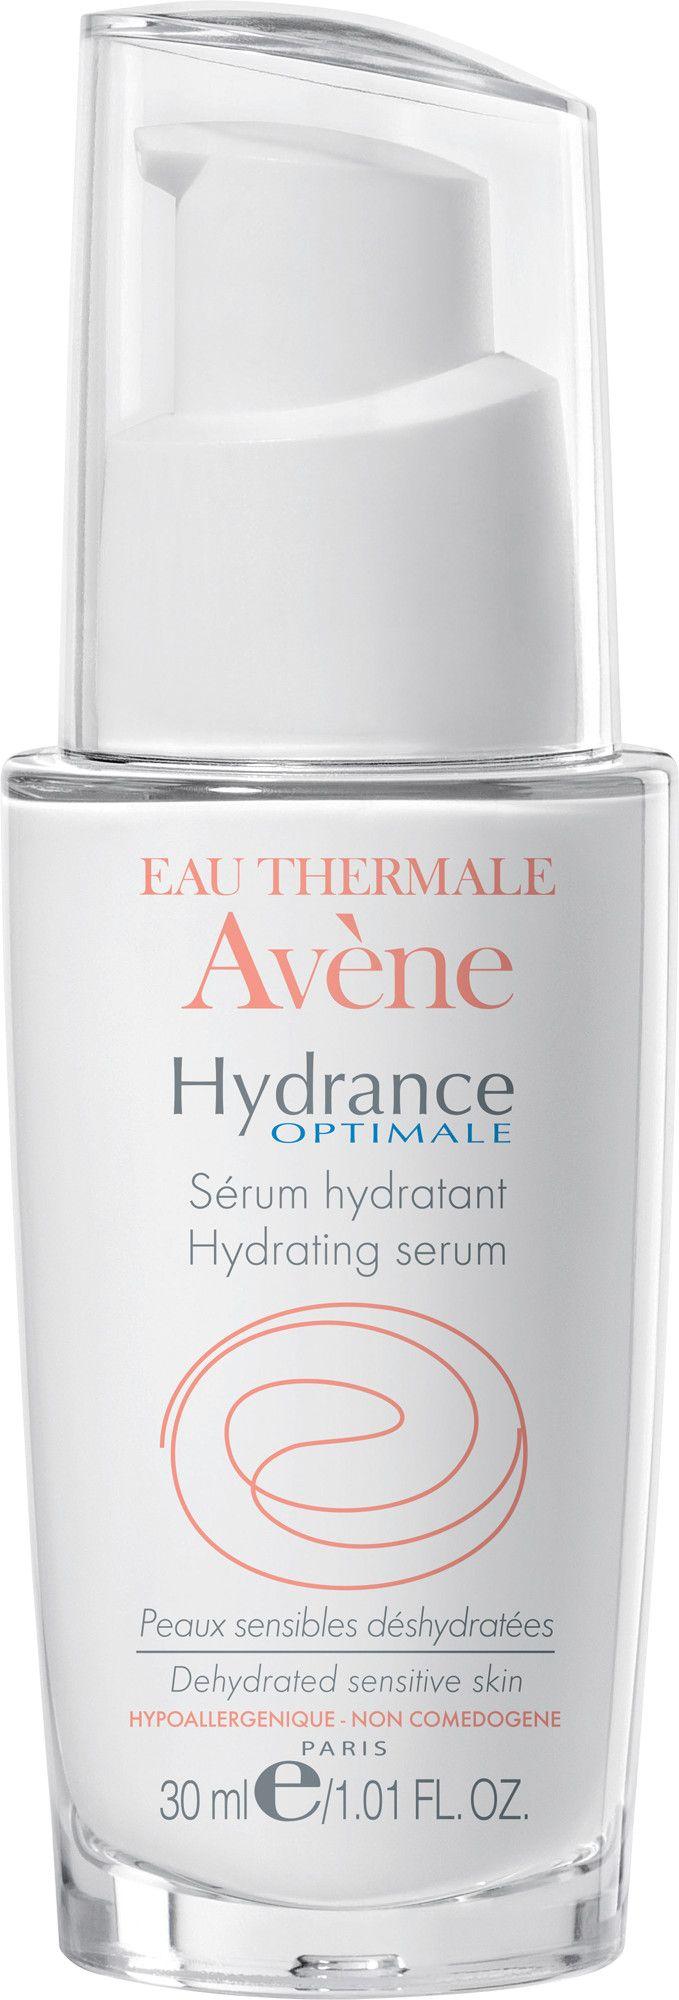 Avene Hydrance Optimale Hydrating Serum 30ml